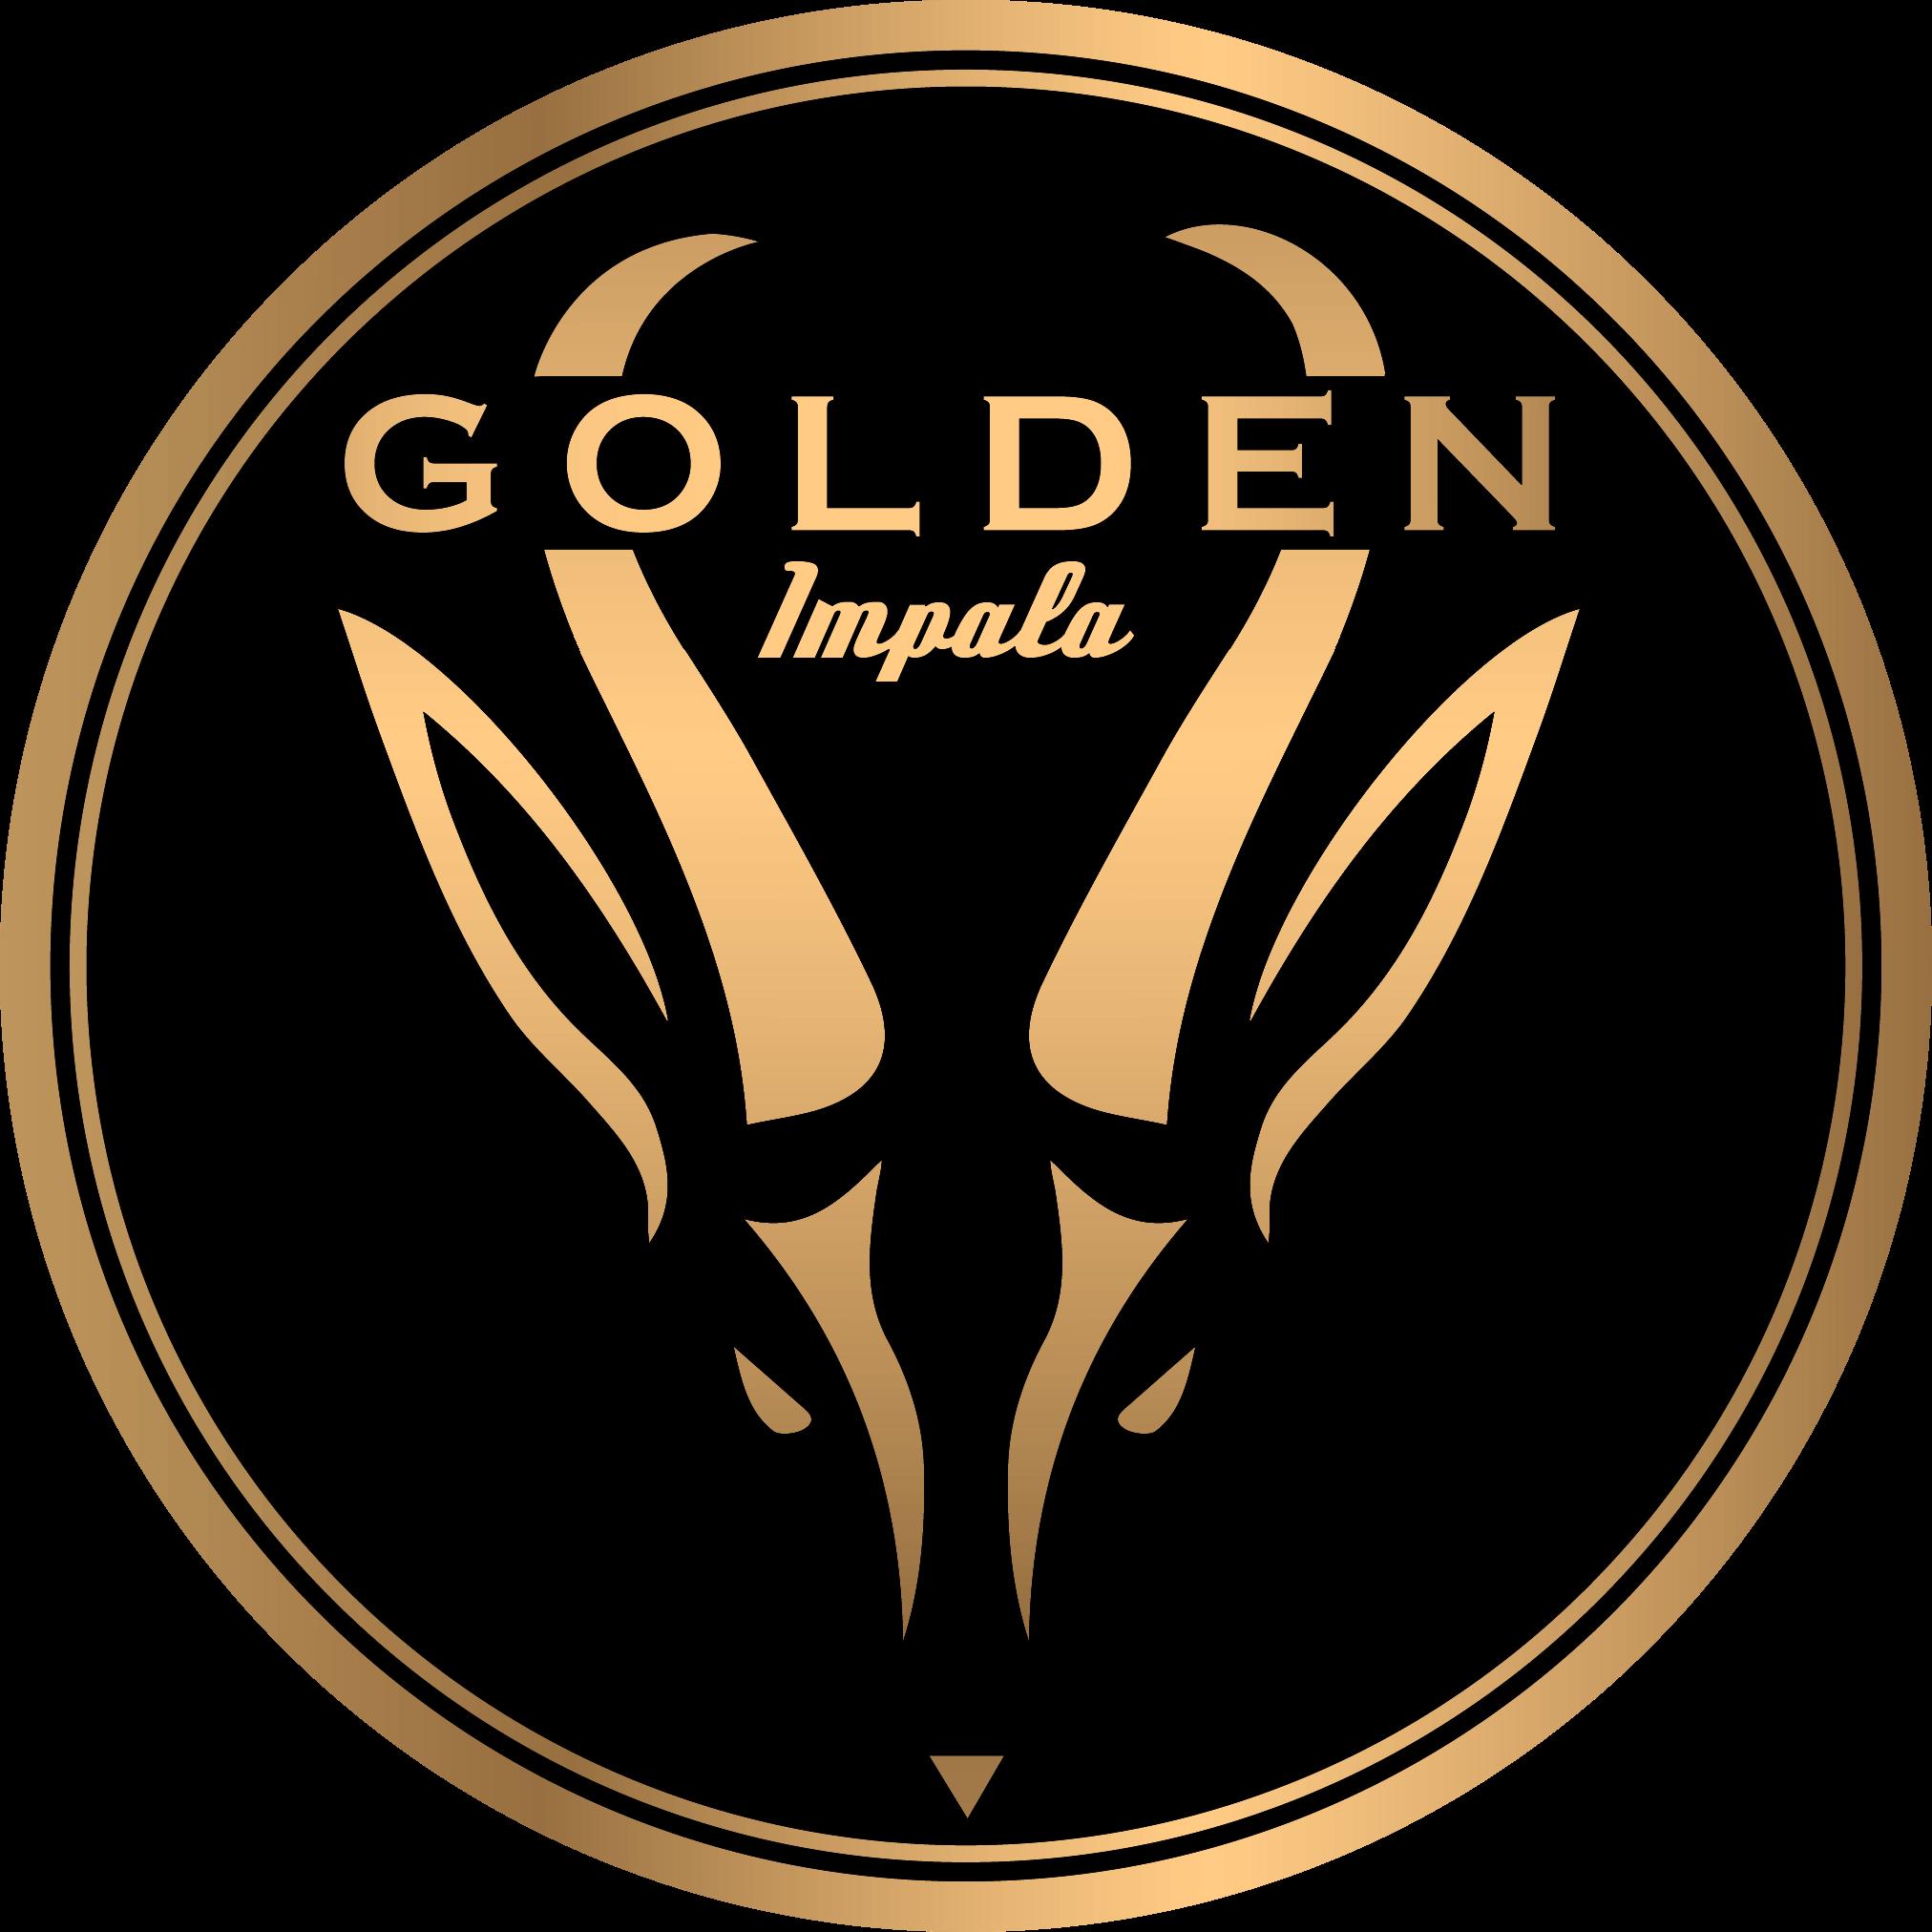 Golden Impala